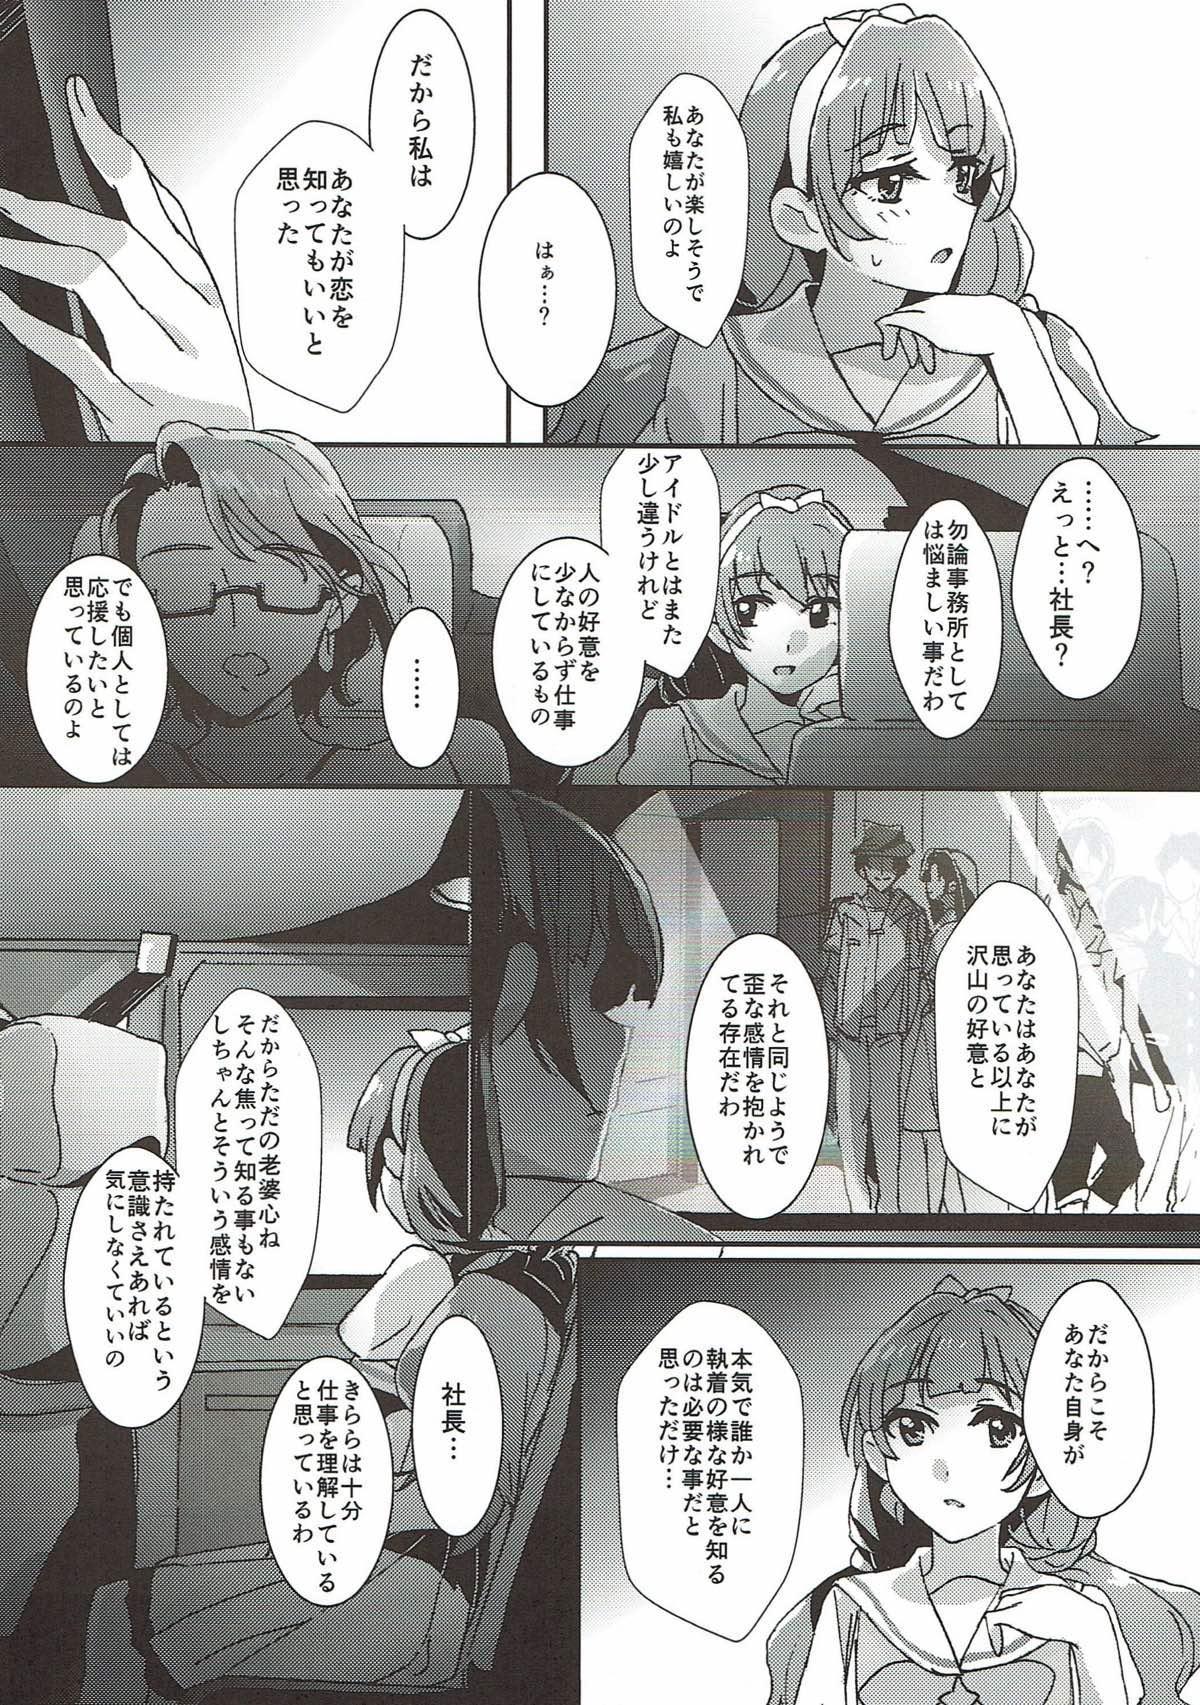 Sensei to Atashi 14